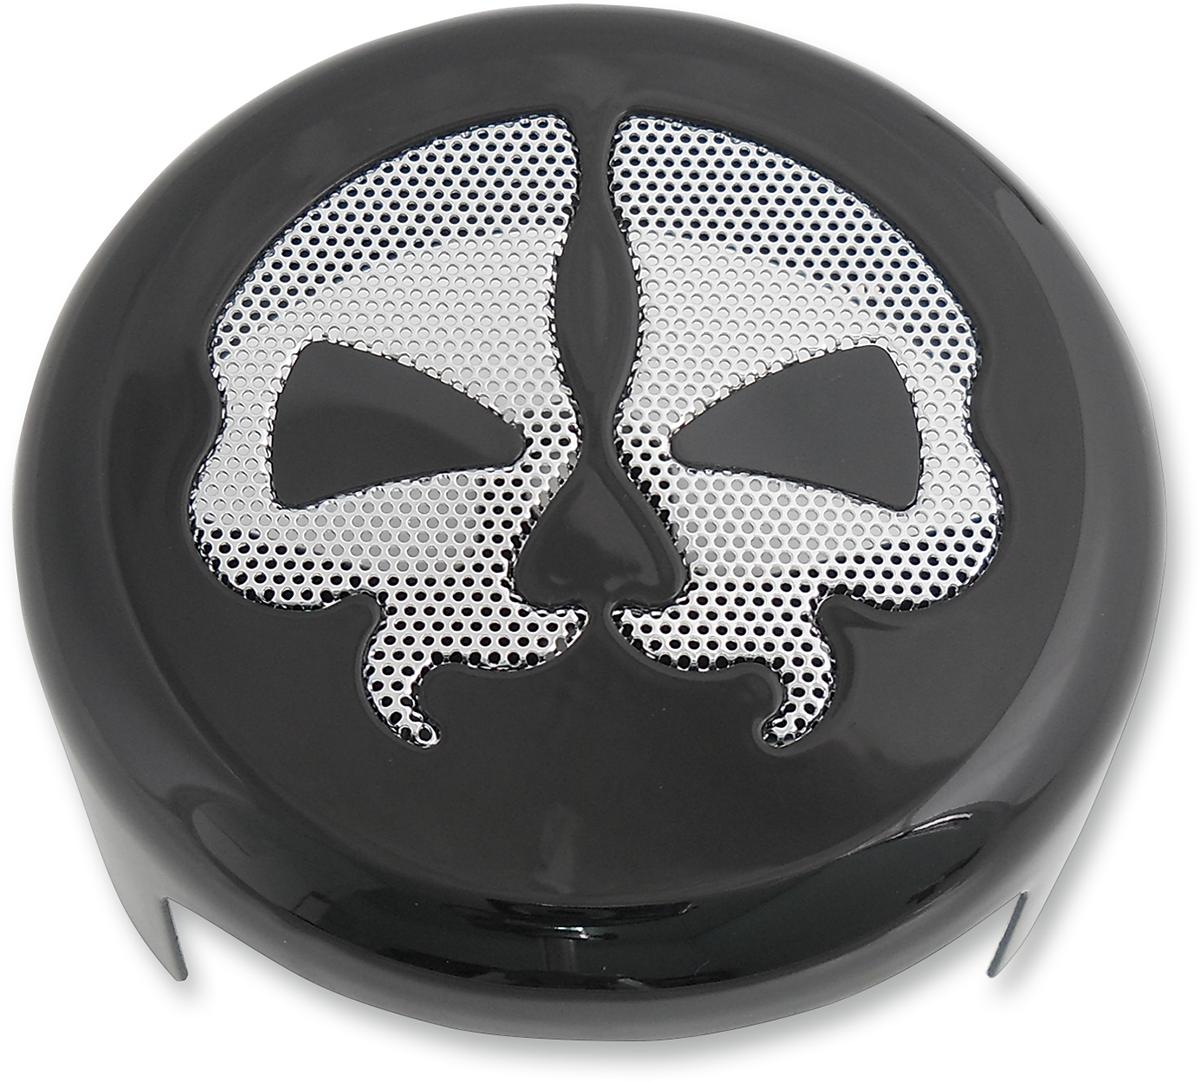 "Drag Specialties 4 5/8"" Powder Coated Steel Split Skull Motorcycle Horn Cover"